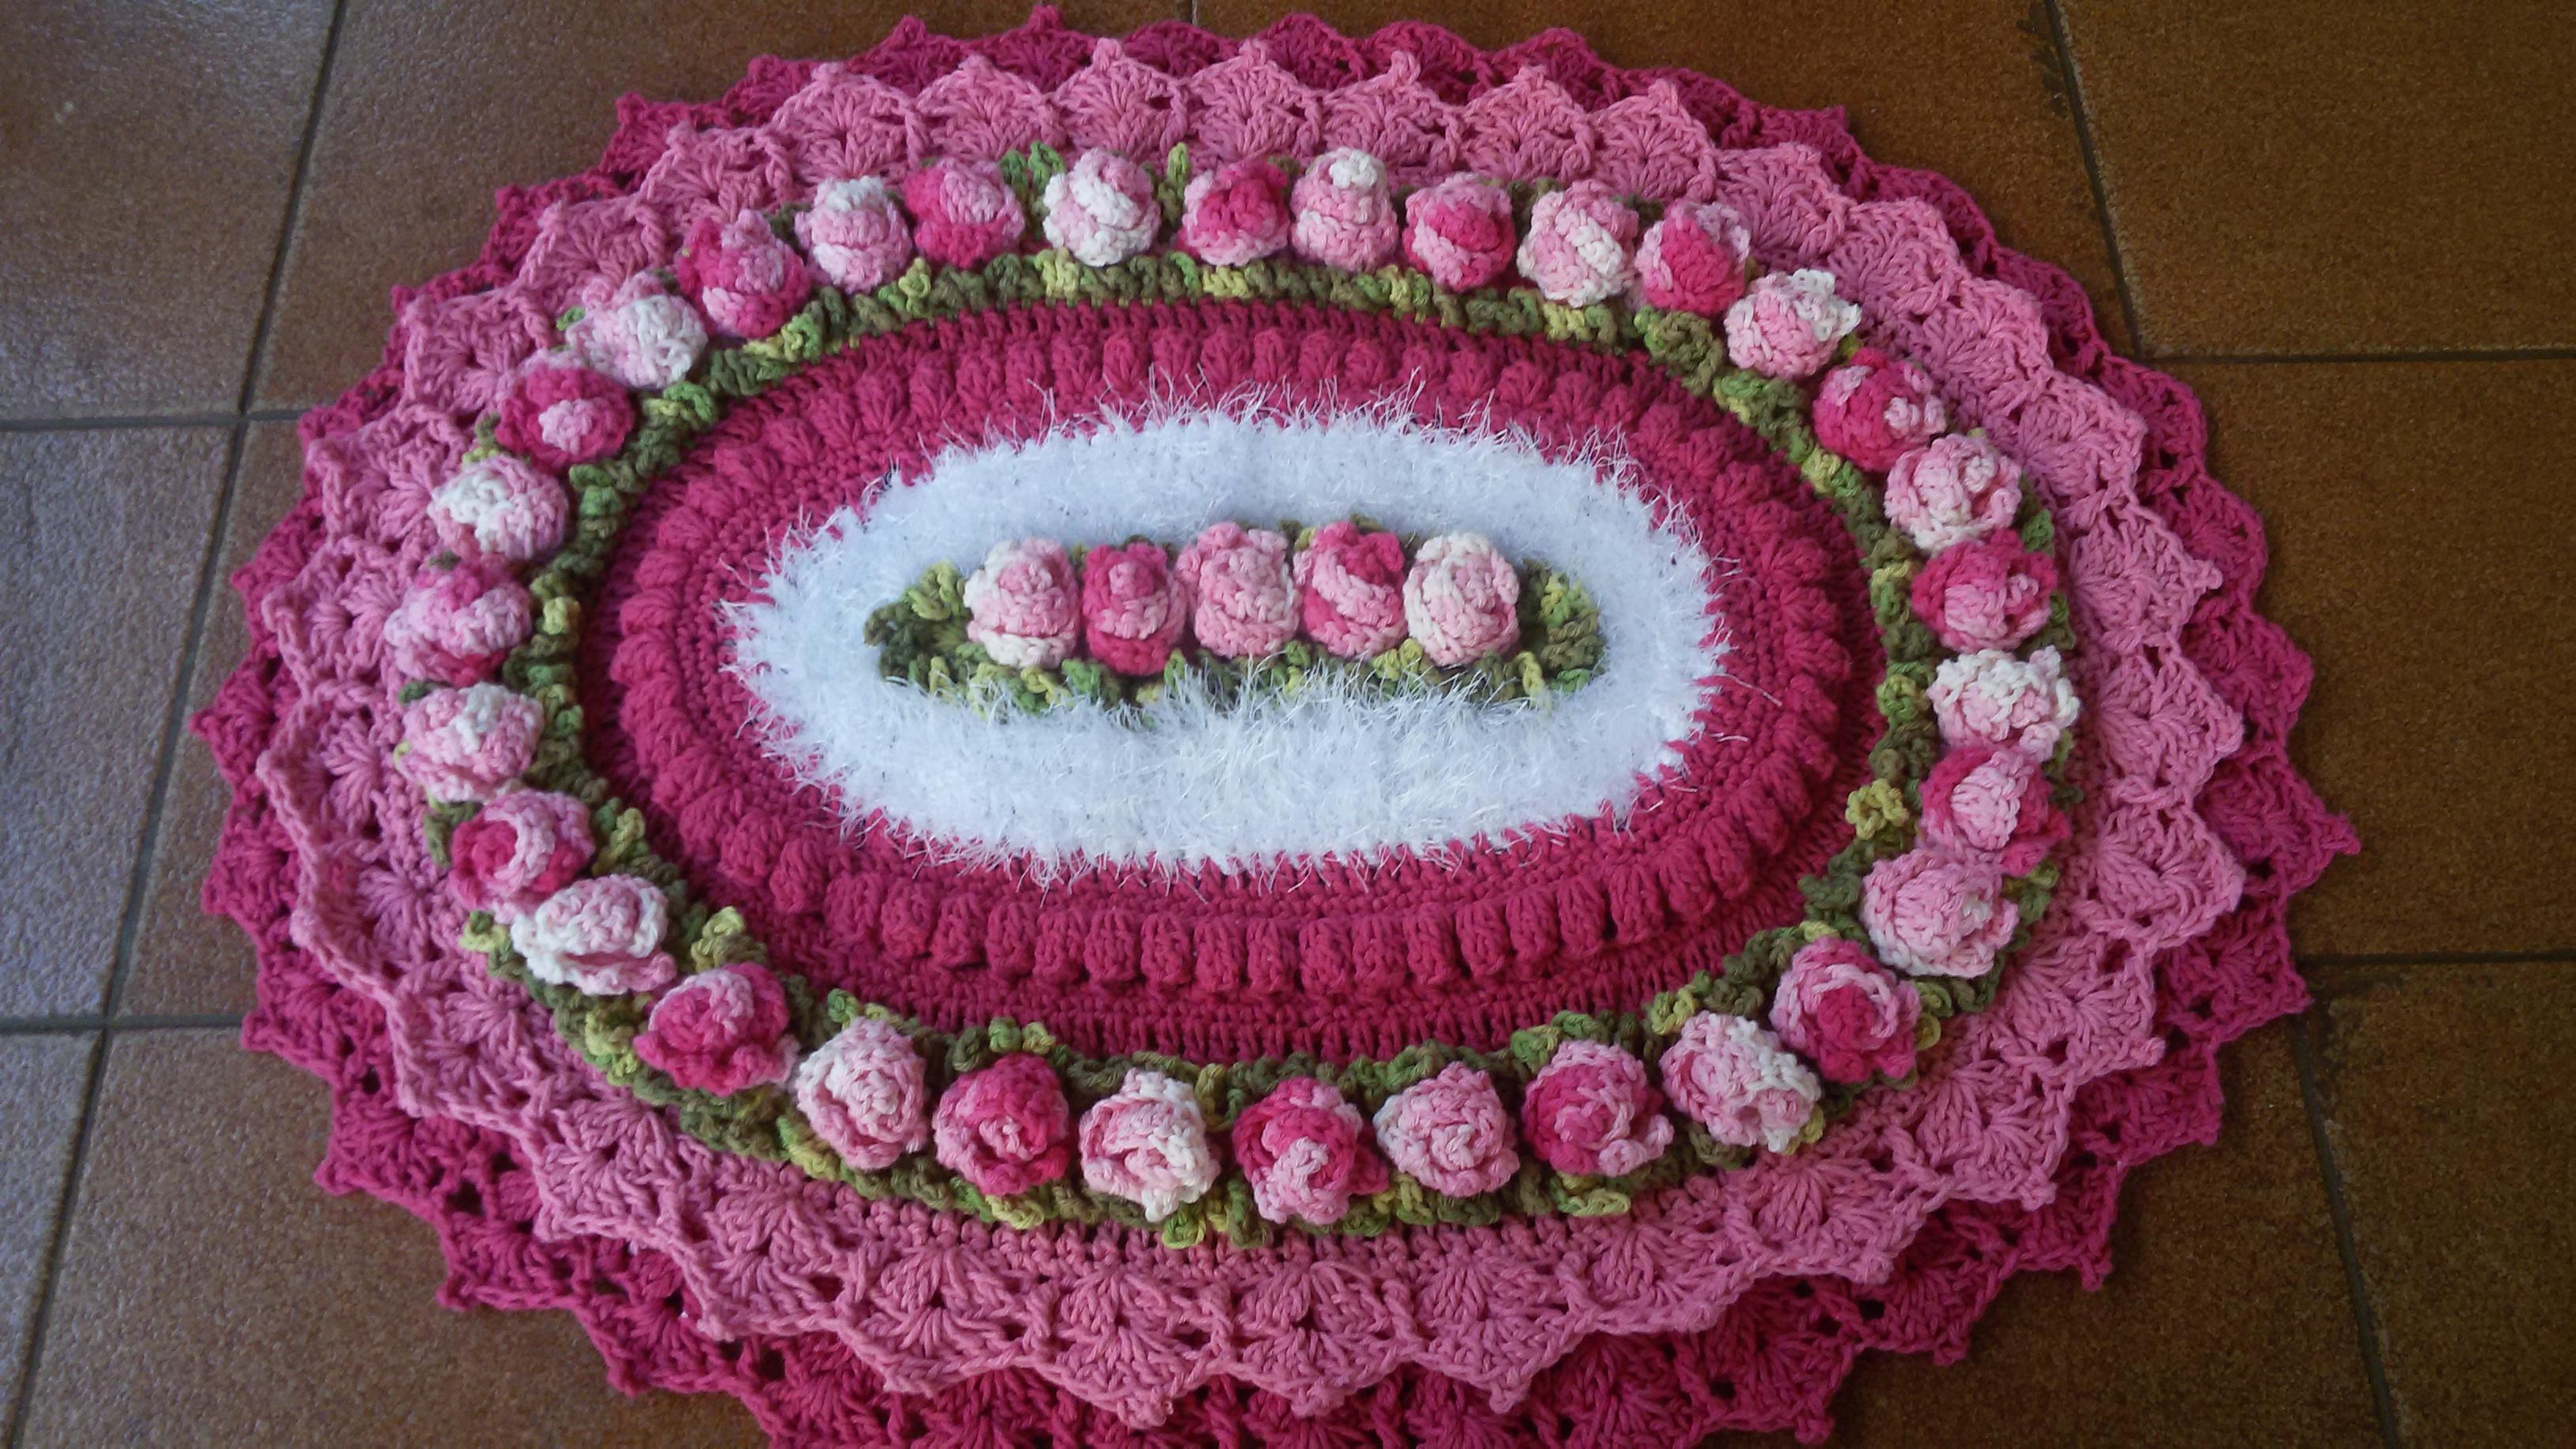 Tapete brinco de princesa pink juliana parrila artes elo7 for Tapete pink